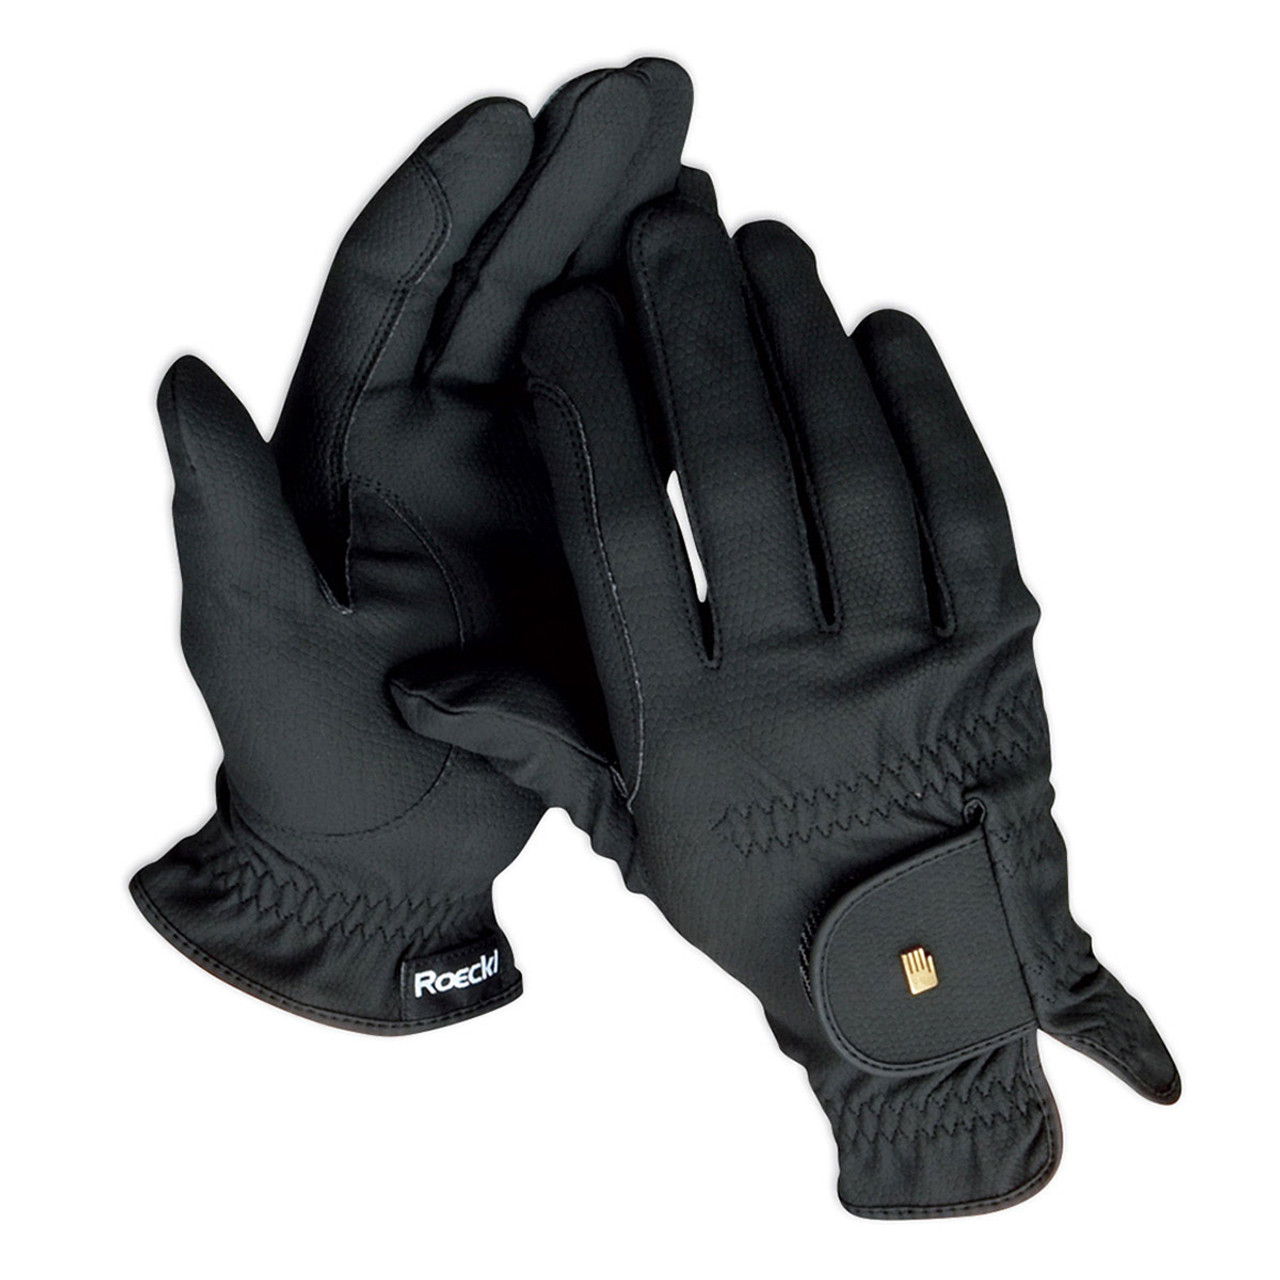 Roeck-Grip Riding Glove